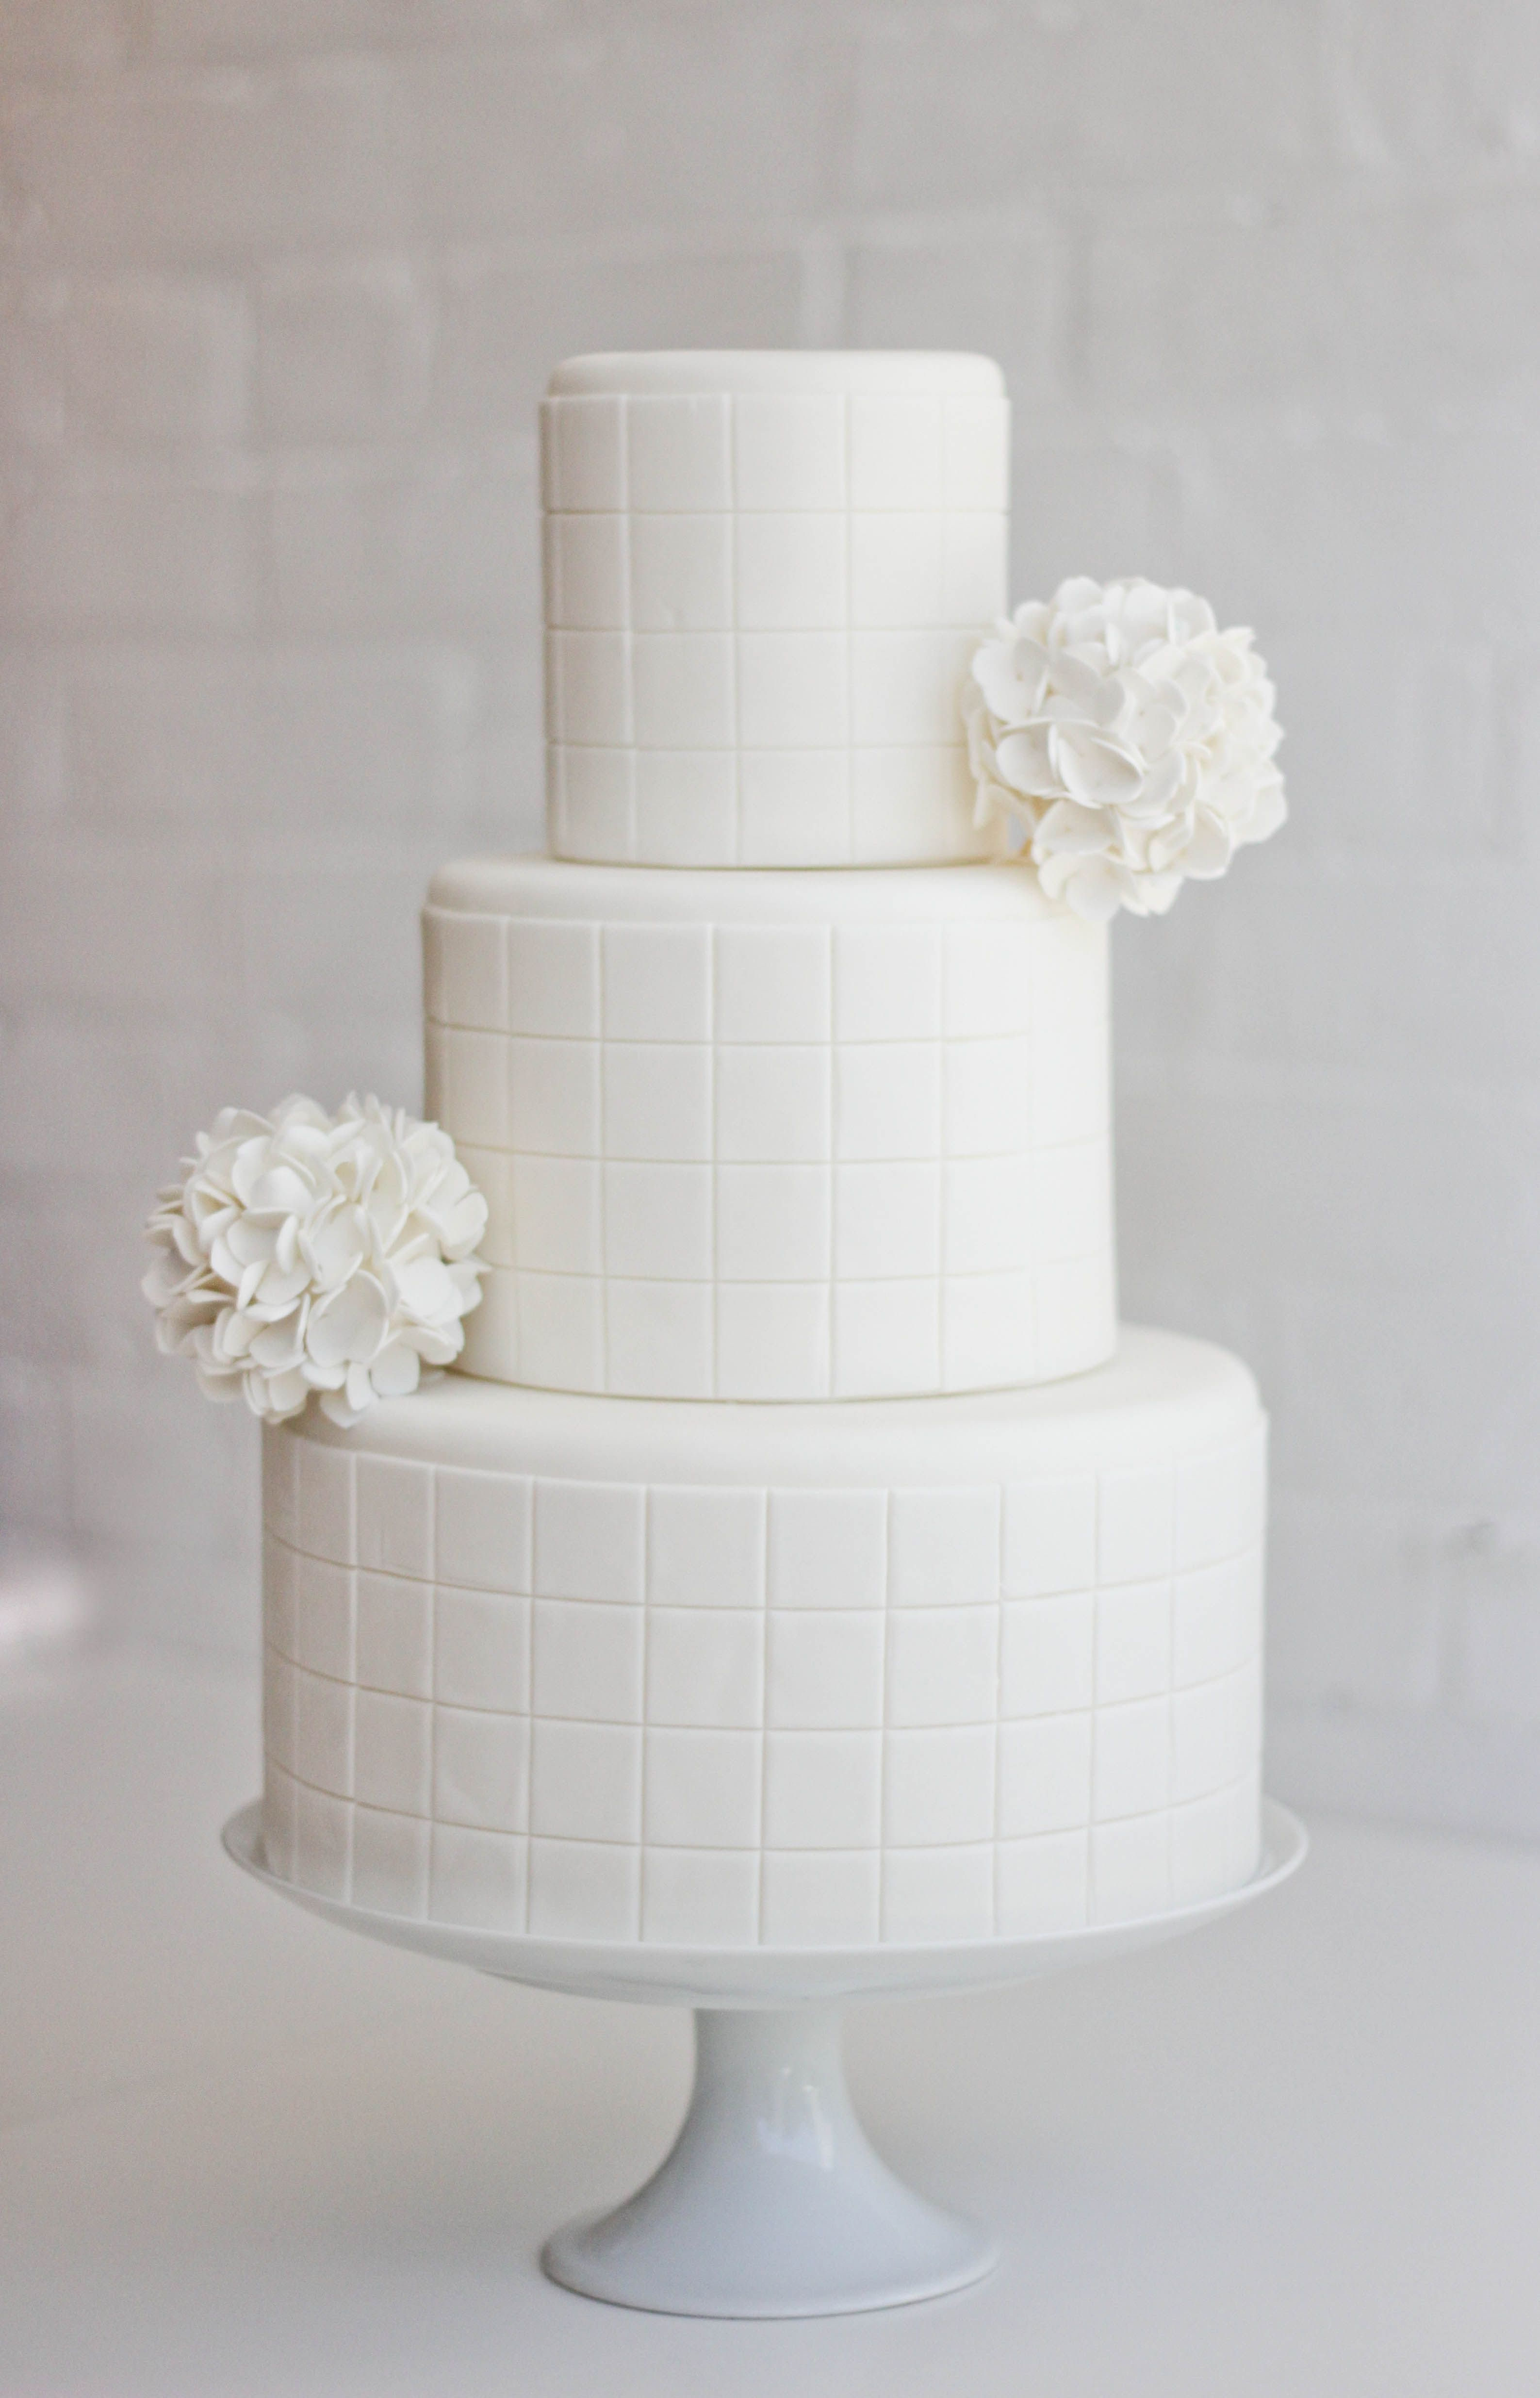 Gorgeous white squares design wedding cake with flowers we